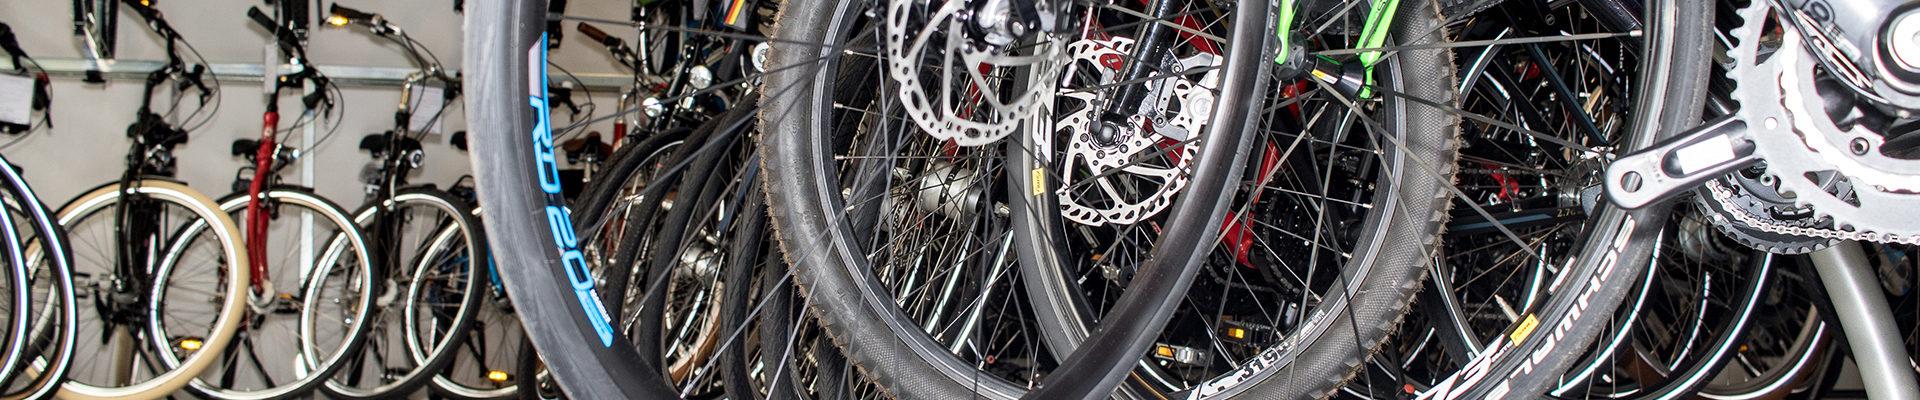 Kategorie: Elektro-Bikes